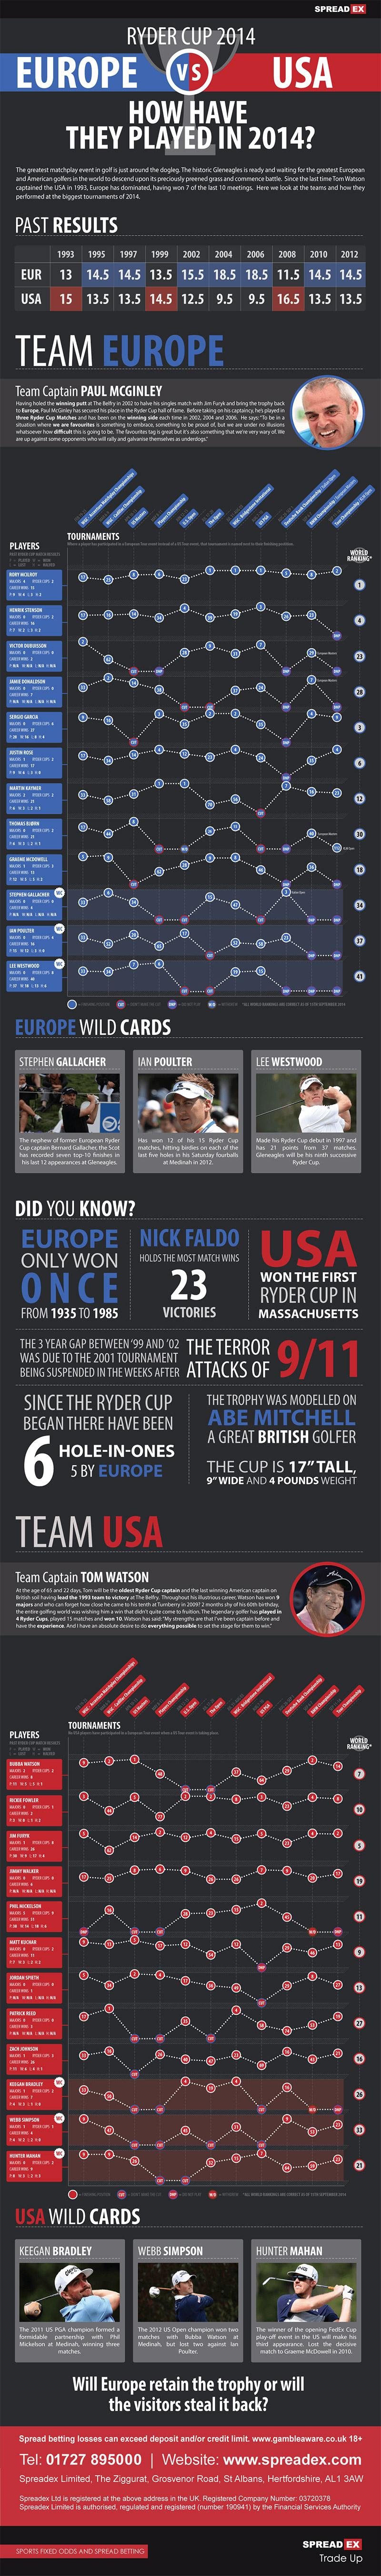 SpreadEx_Ryder-Cup_Infographic_Final_Comp_V2